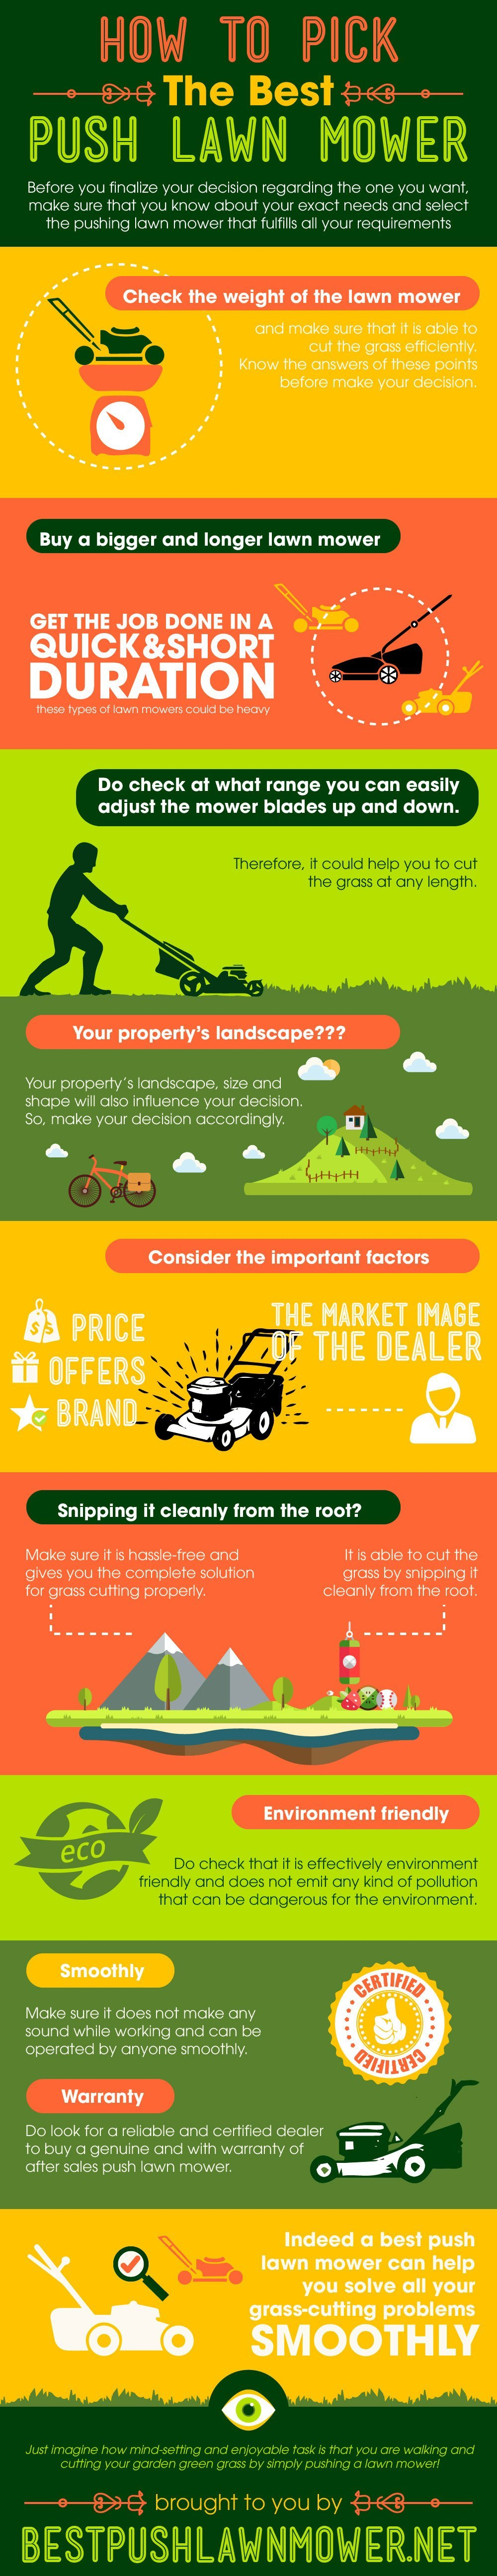 best push lawn mower infographic